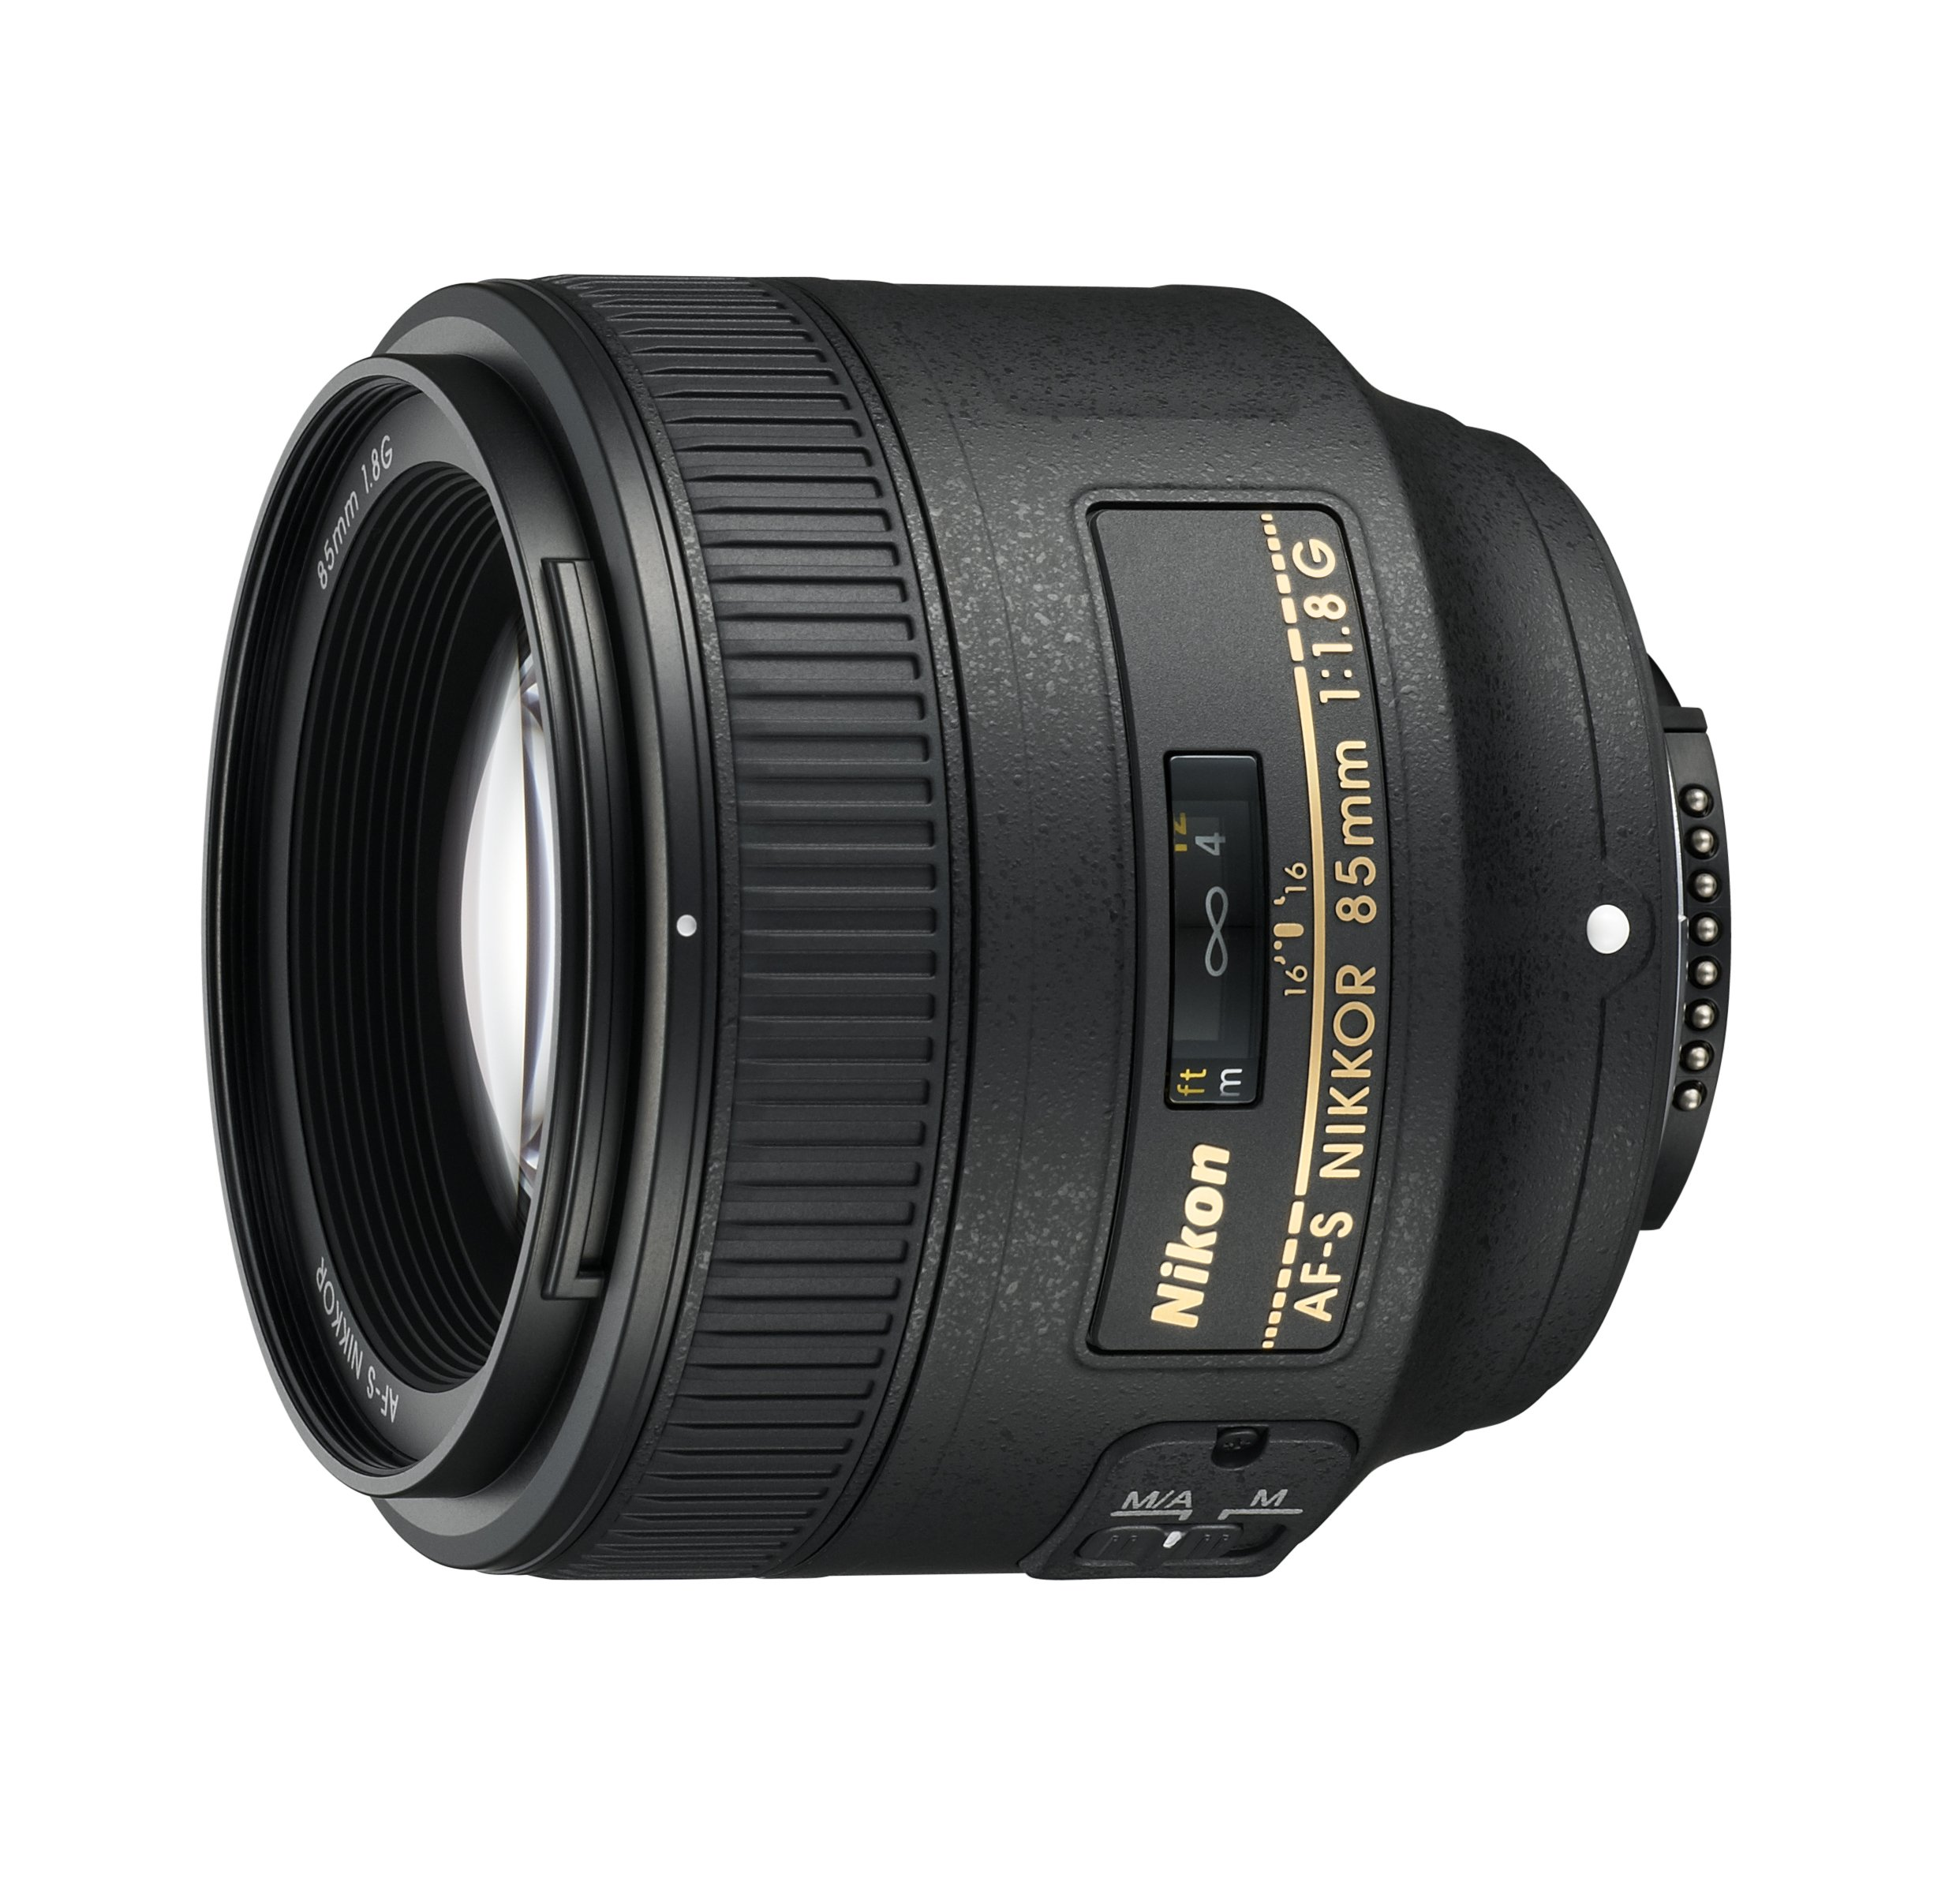 Nikon AF S NIKKOR 85mm f/1.8G Fixed Lens with Auto Focus for Nikon DSLR Cameras by Nikon